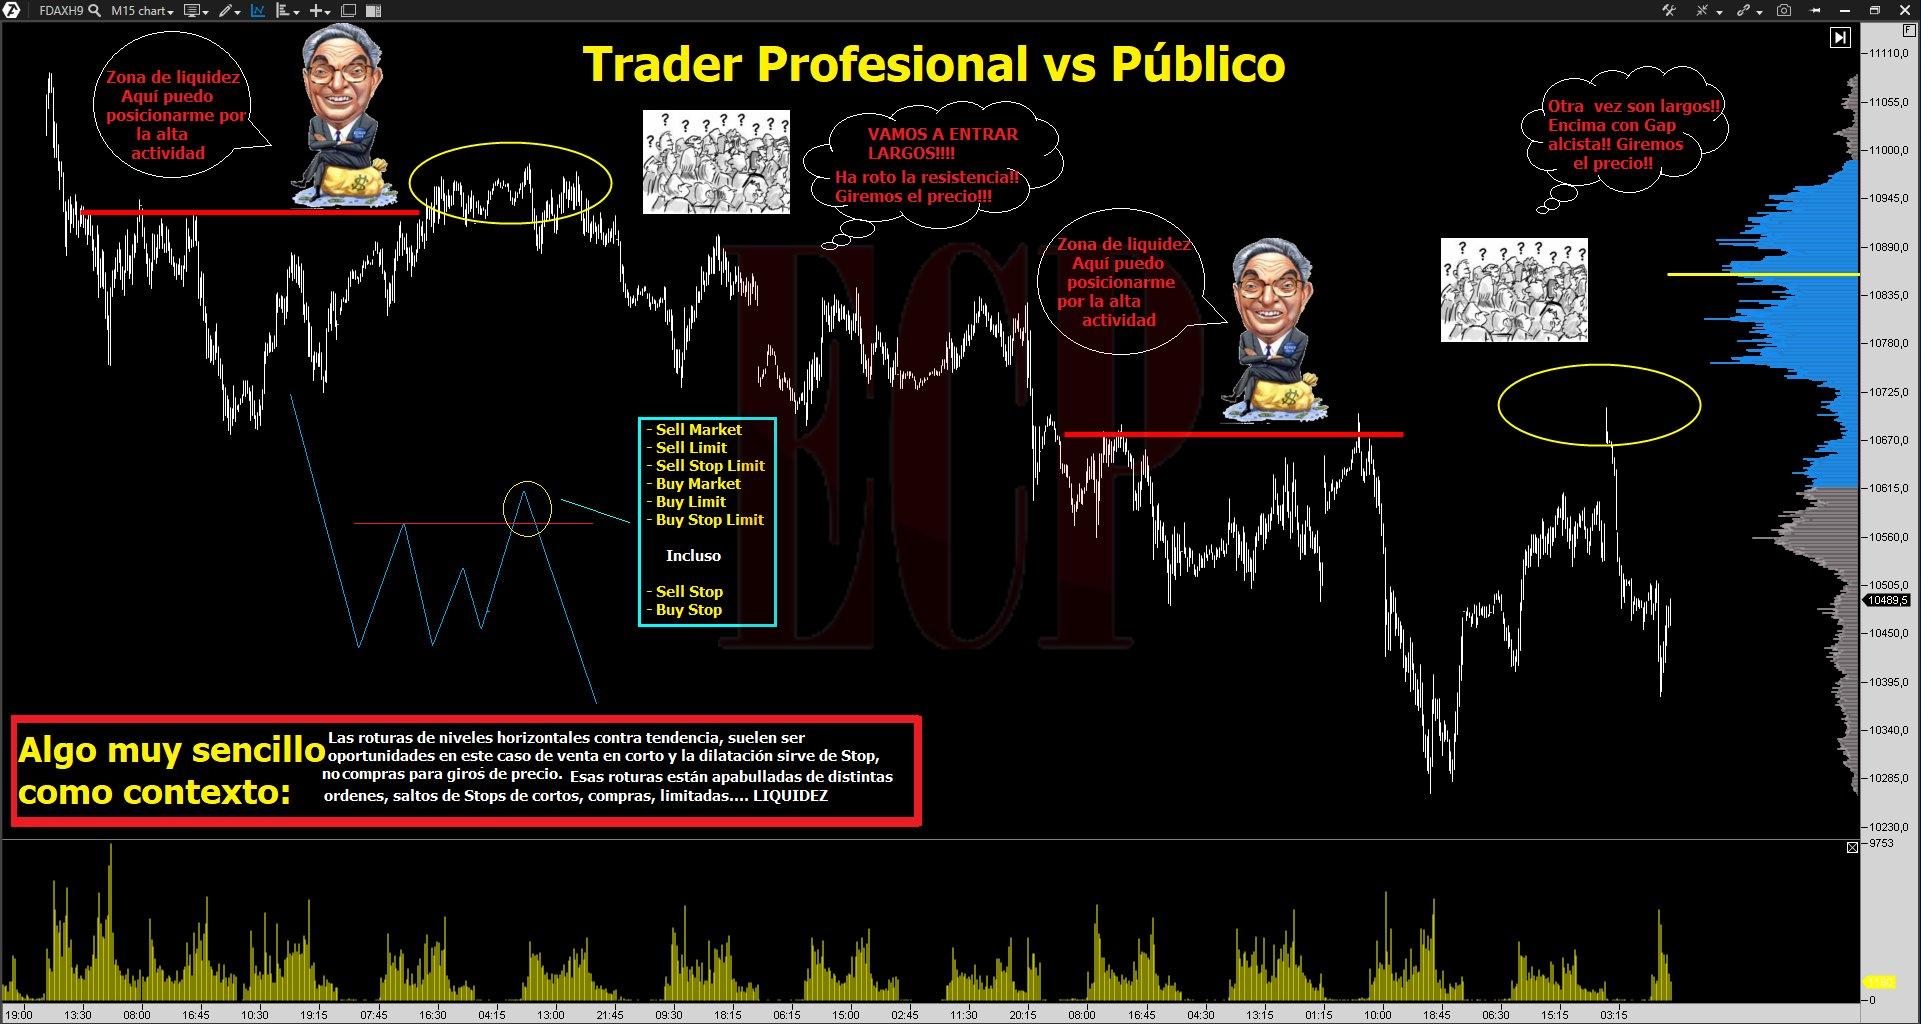 Volume Profile Trading Enric Jaimez (4)